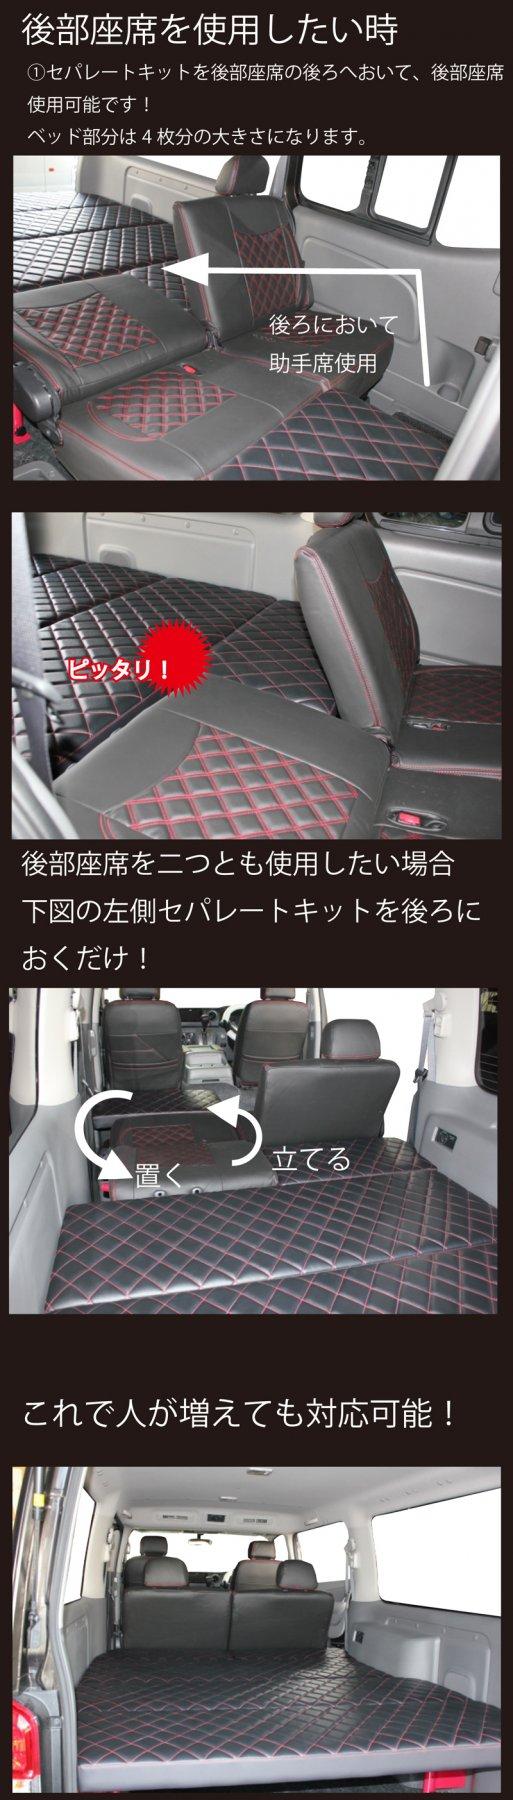 NV350専用ベッドキット説明2